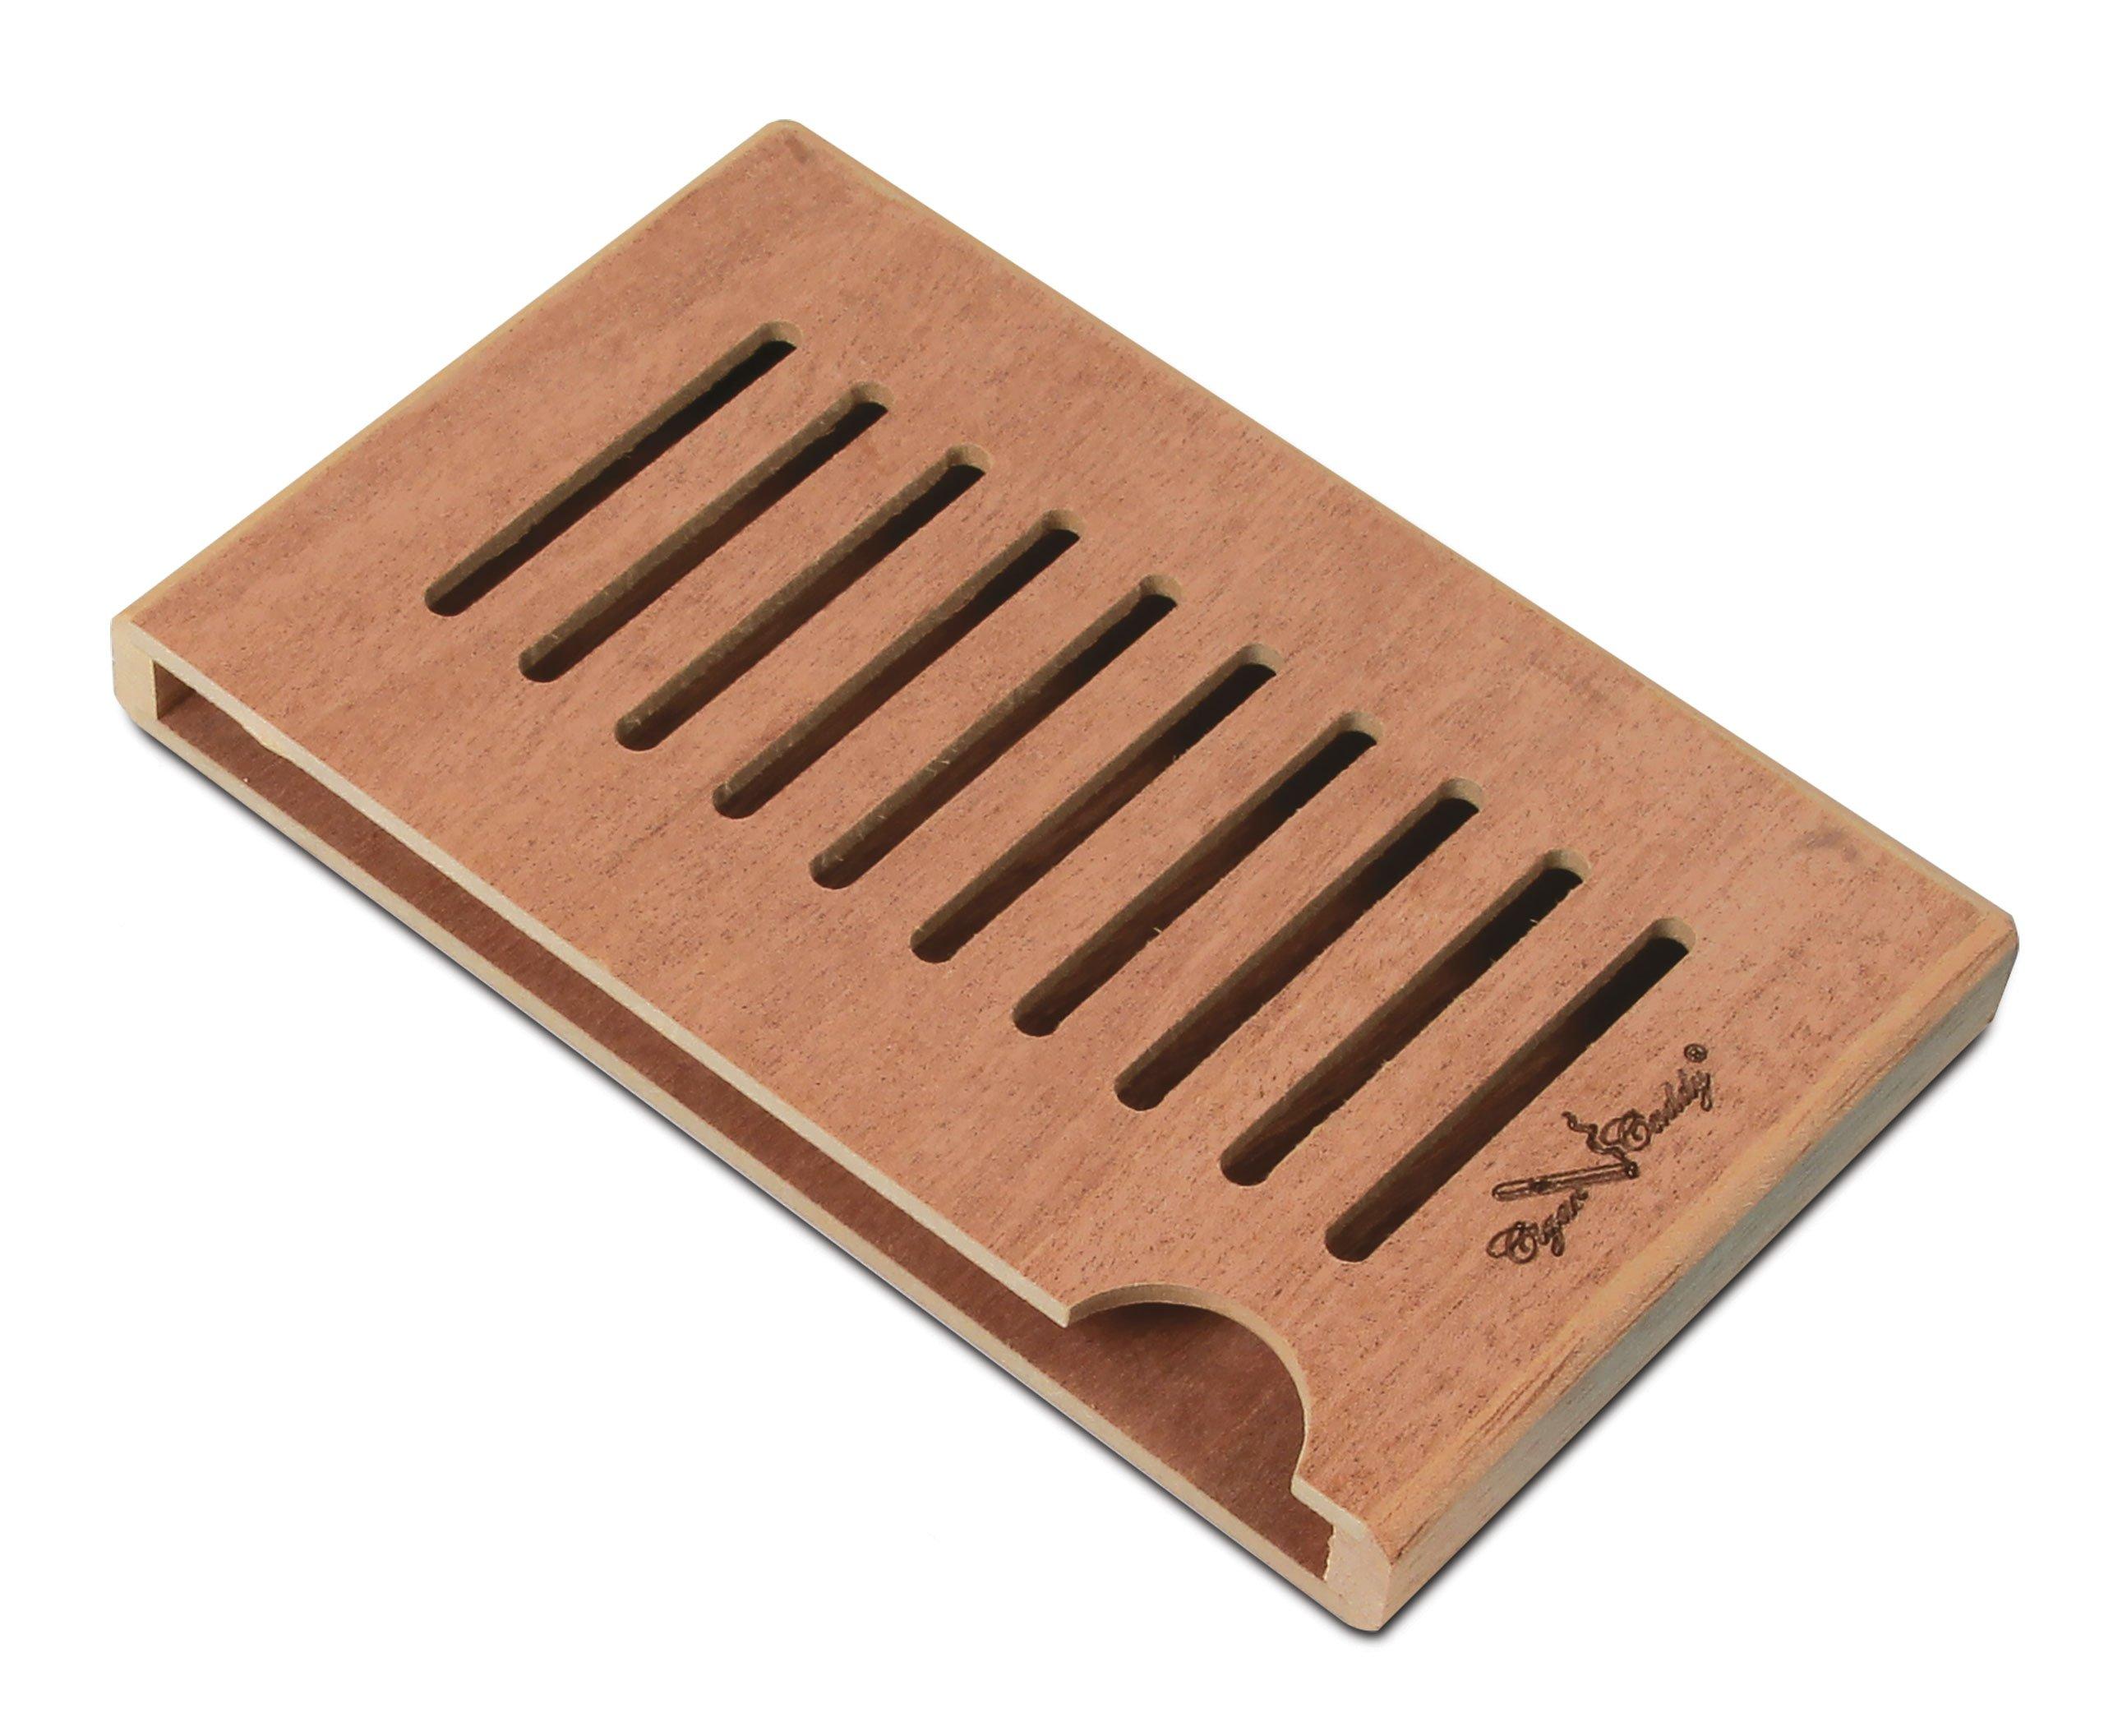 Cigar Caddy Single Boveda Pack Holder, 5 x 3.75 x 6